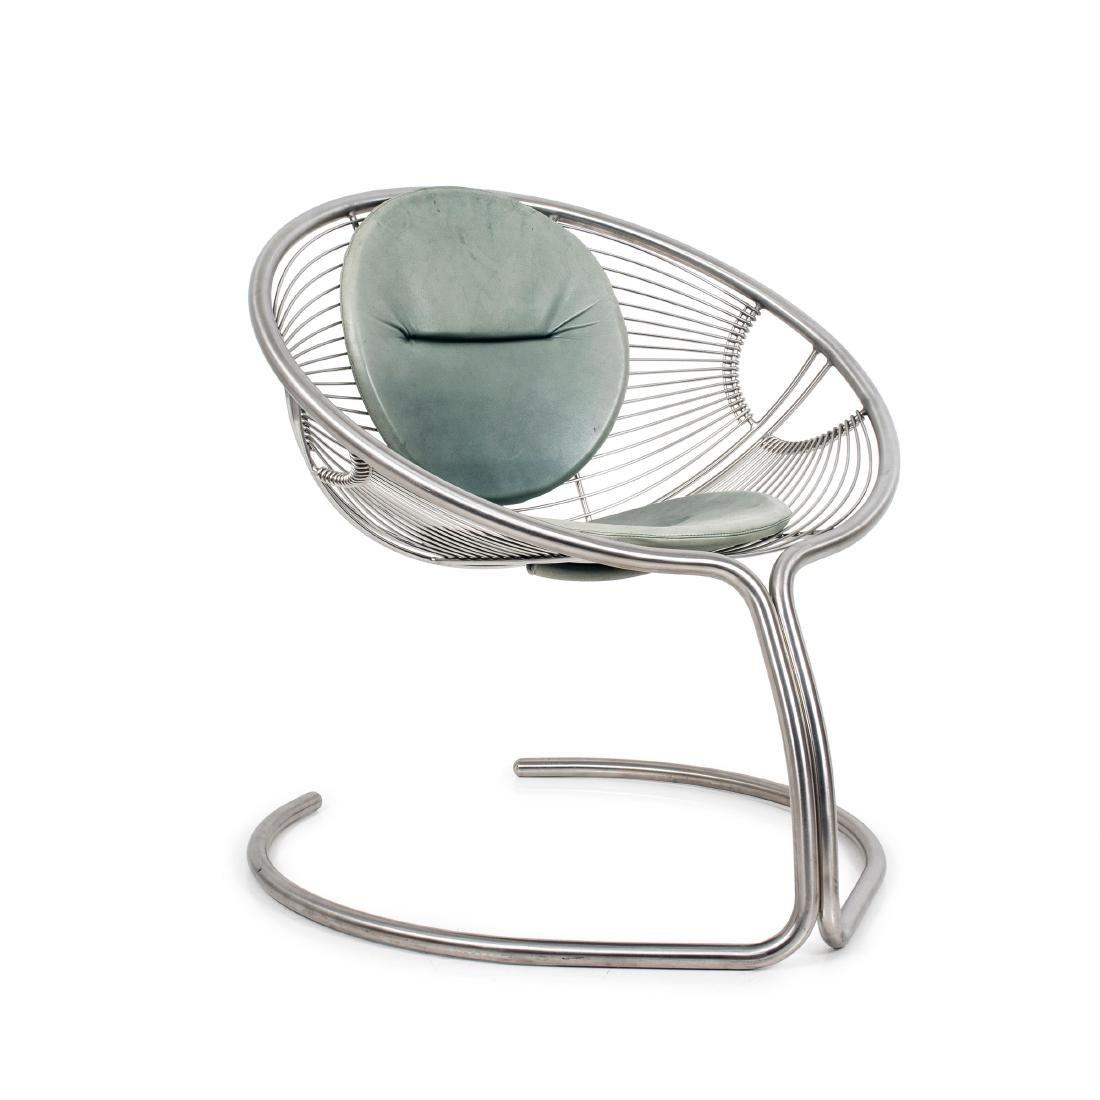 'Schalenschaukler SC 7.1' easy chair, 2005